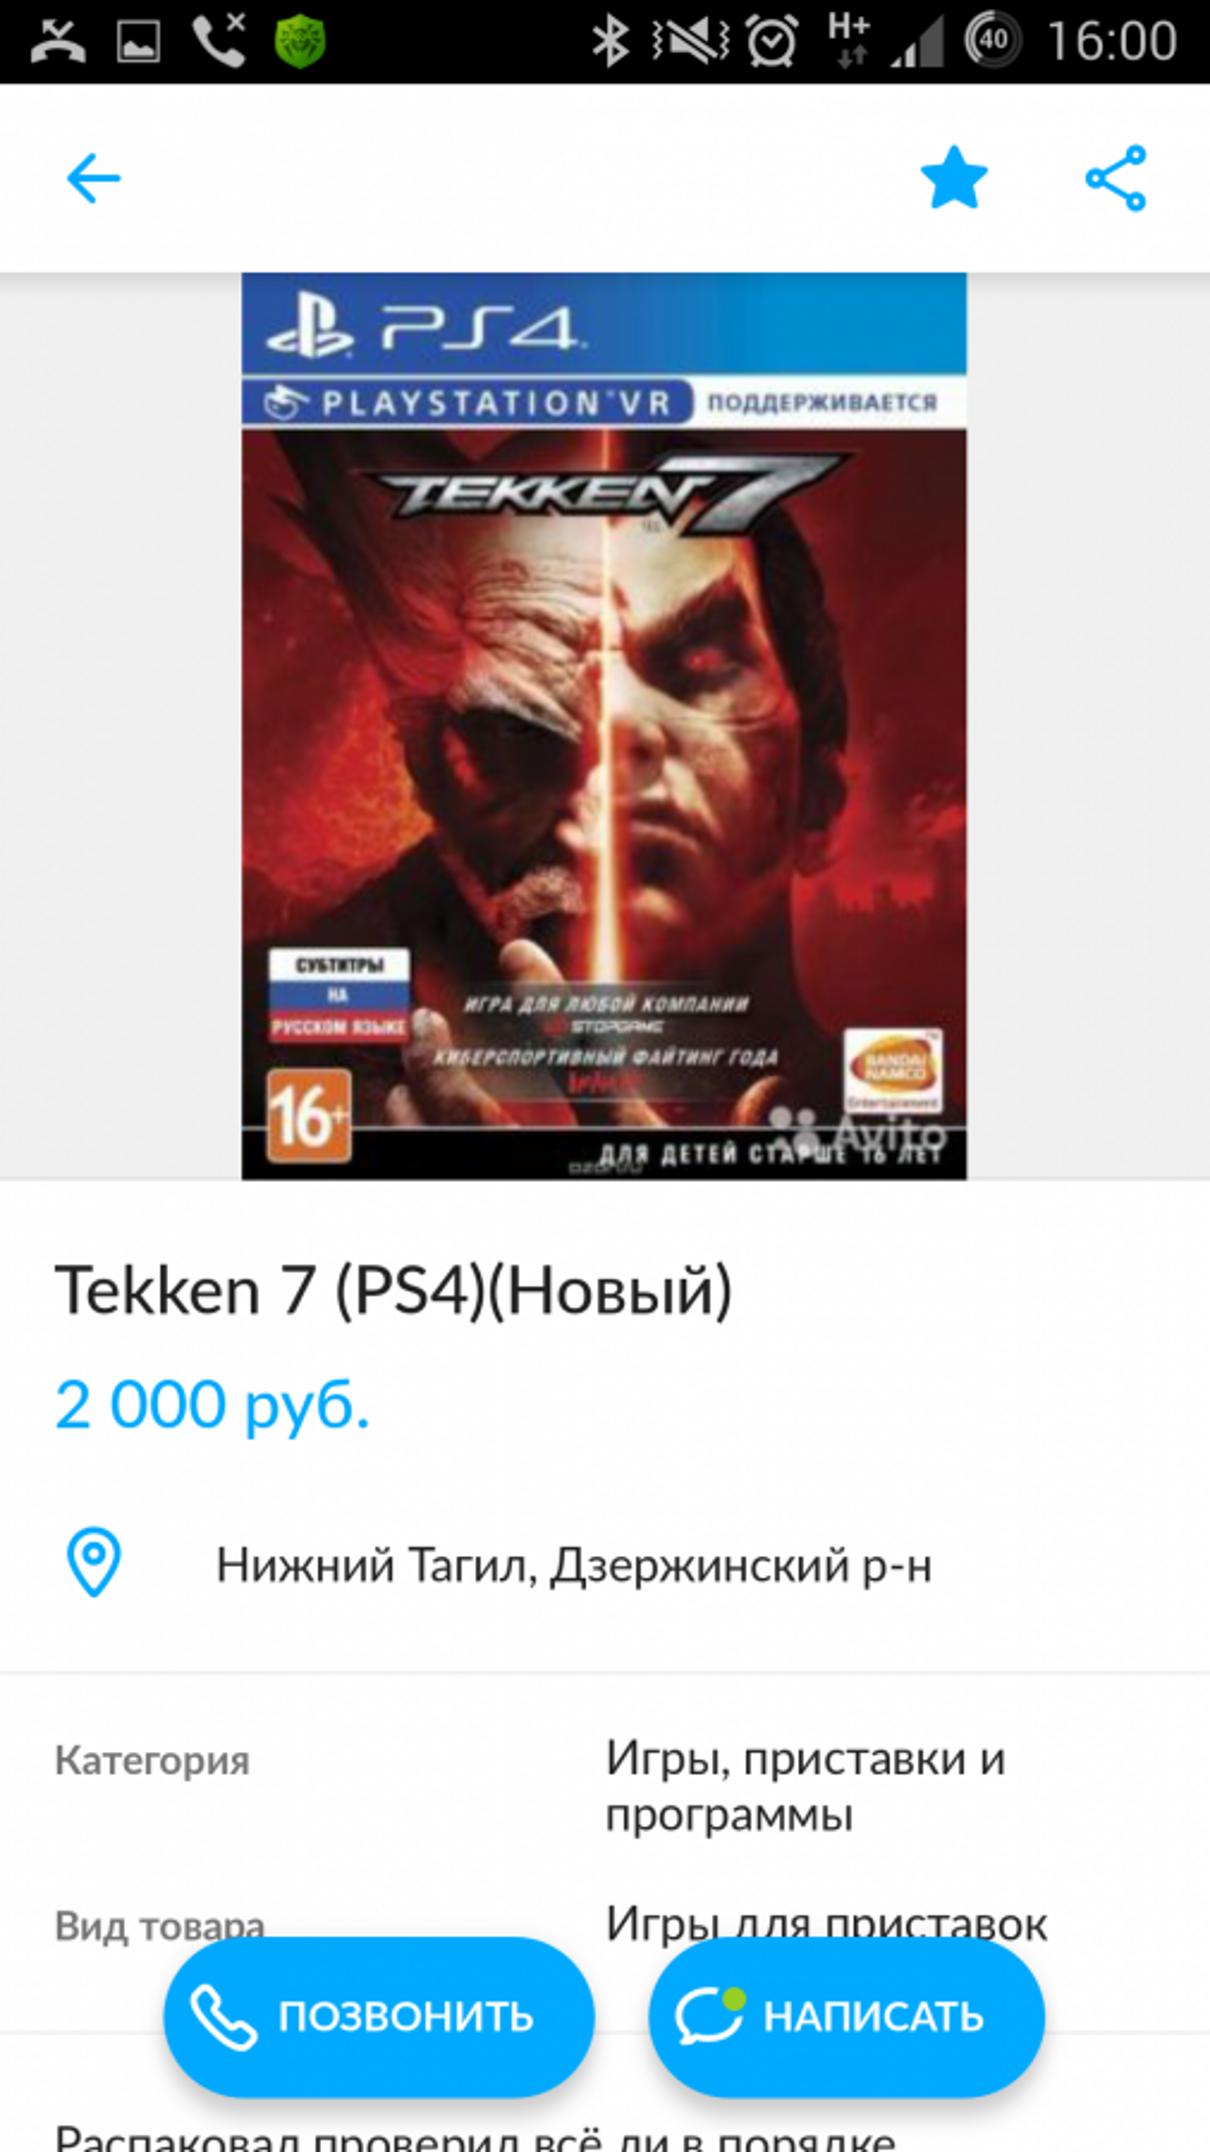 Жалоба-отзыв: Богдан - Не поиграл на PS4.  Фото №1